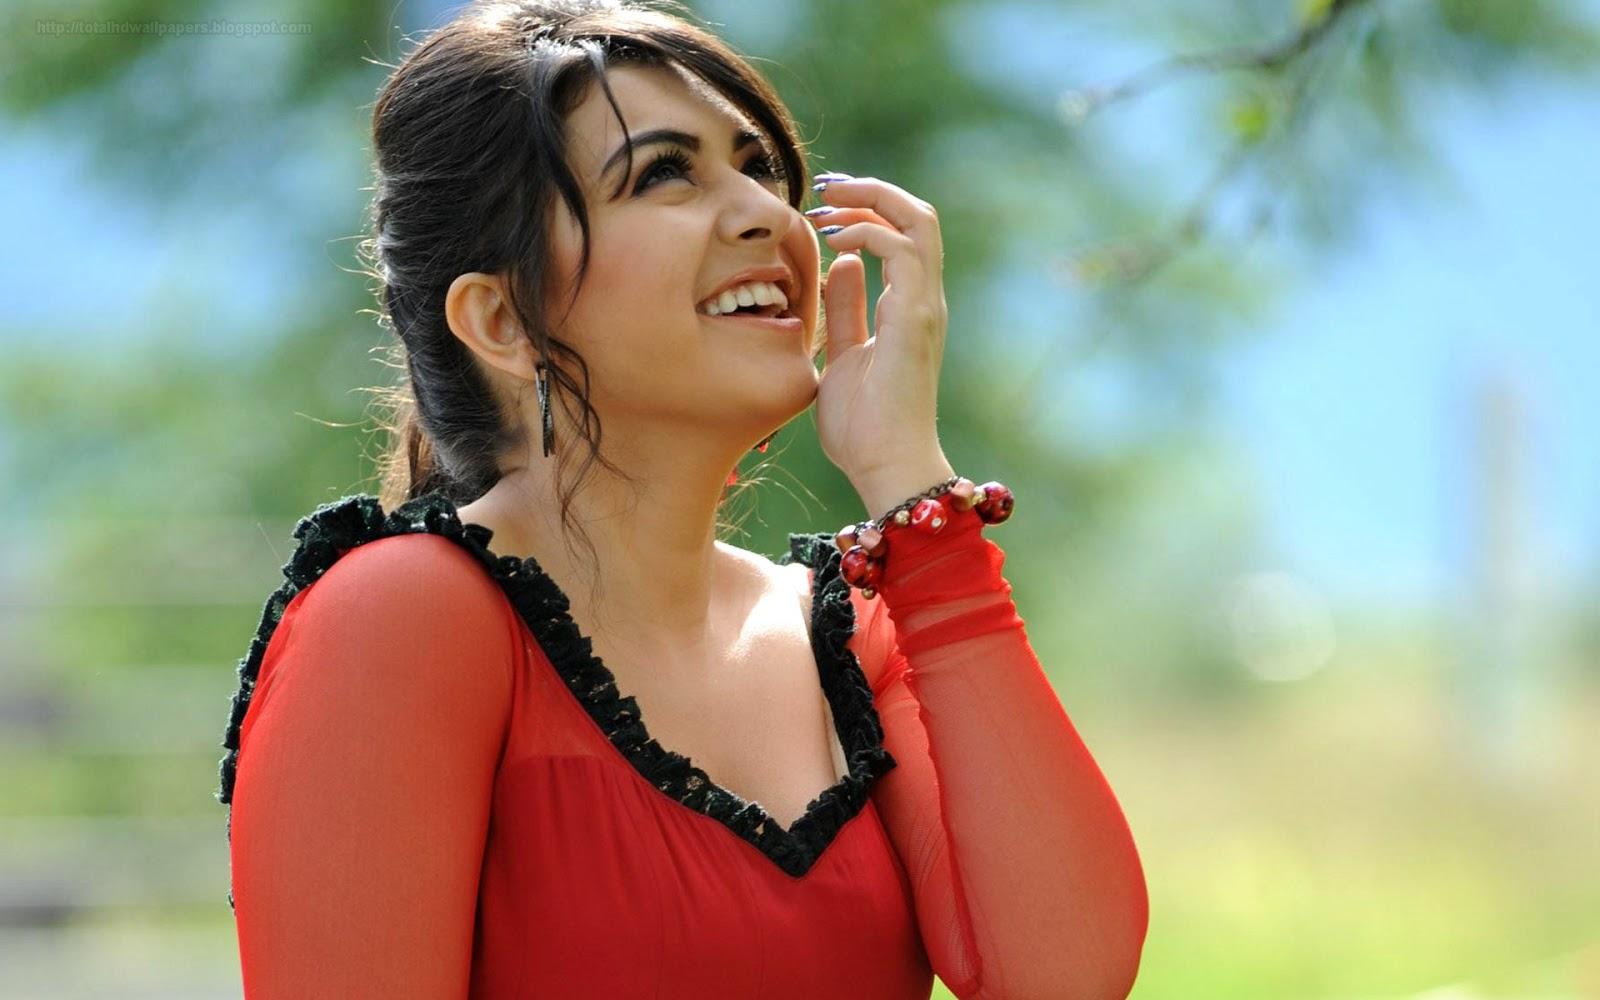 HD Wallpapers Hollywood Actress HD Wallpapers Bollywood Actress HD 1600x1000